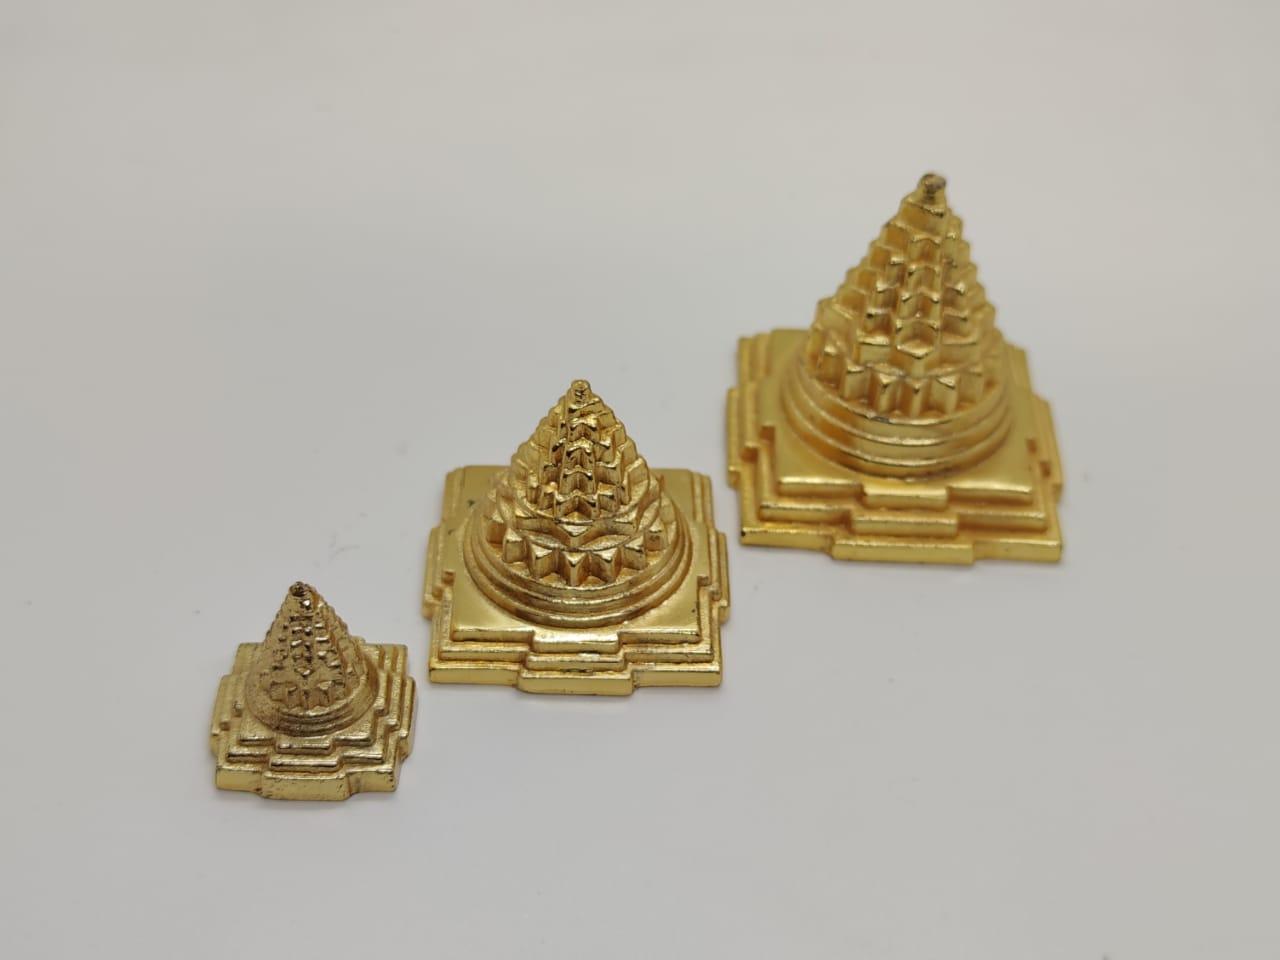 Yantras & Prosperity Items